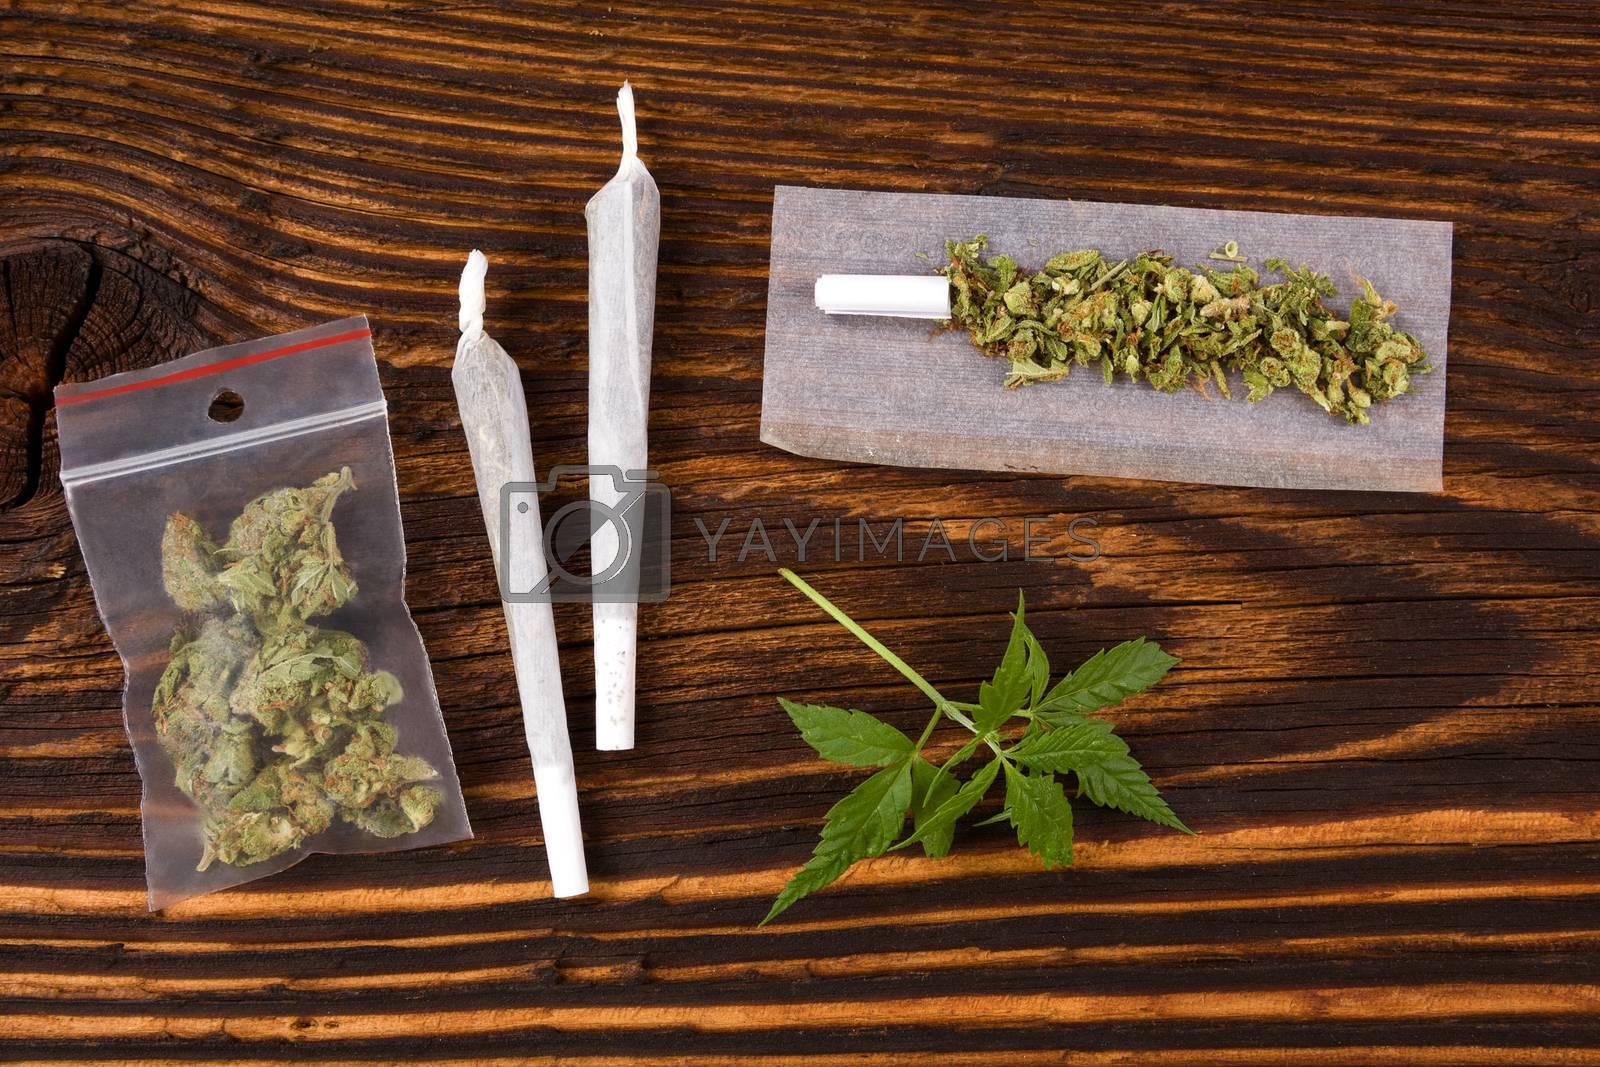 Marijuana background. Cannabis joint, bud in plastic bag and hemp leaves on wooden table. Addictive drug or alternative medicine.